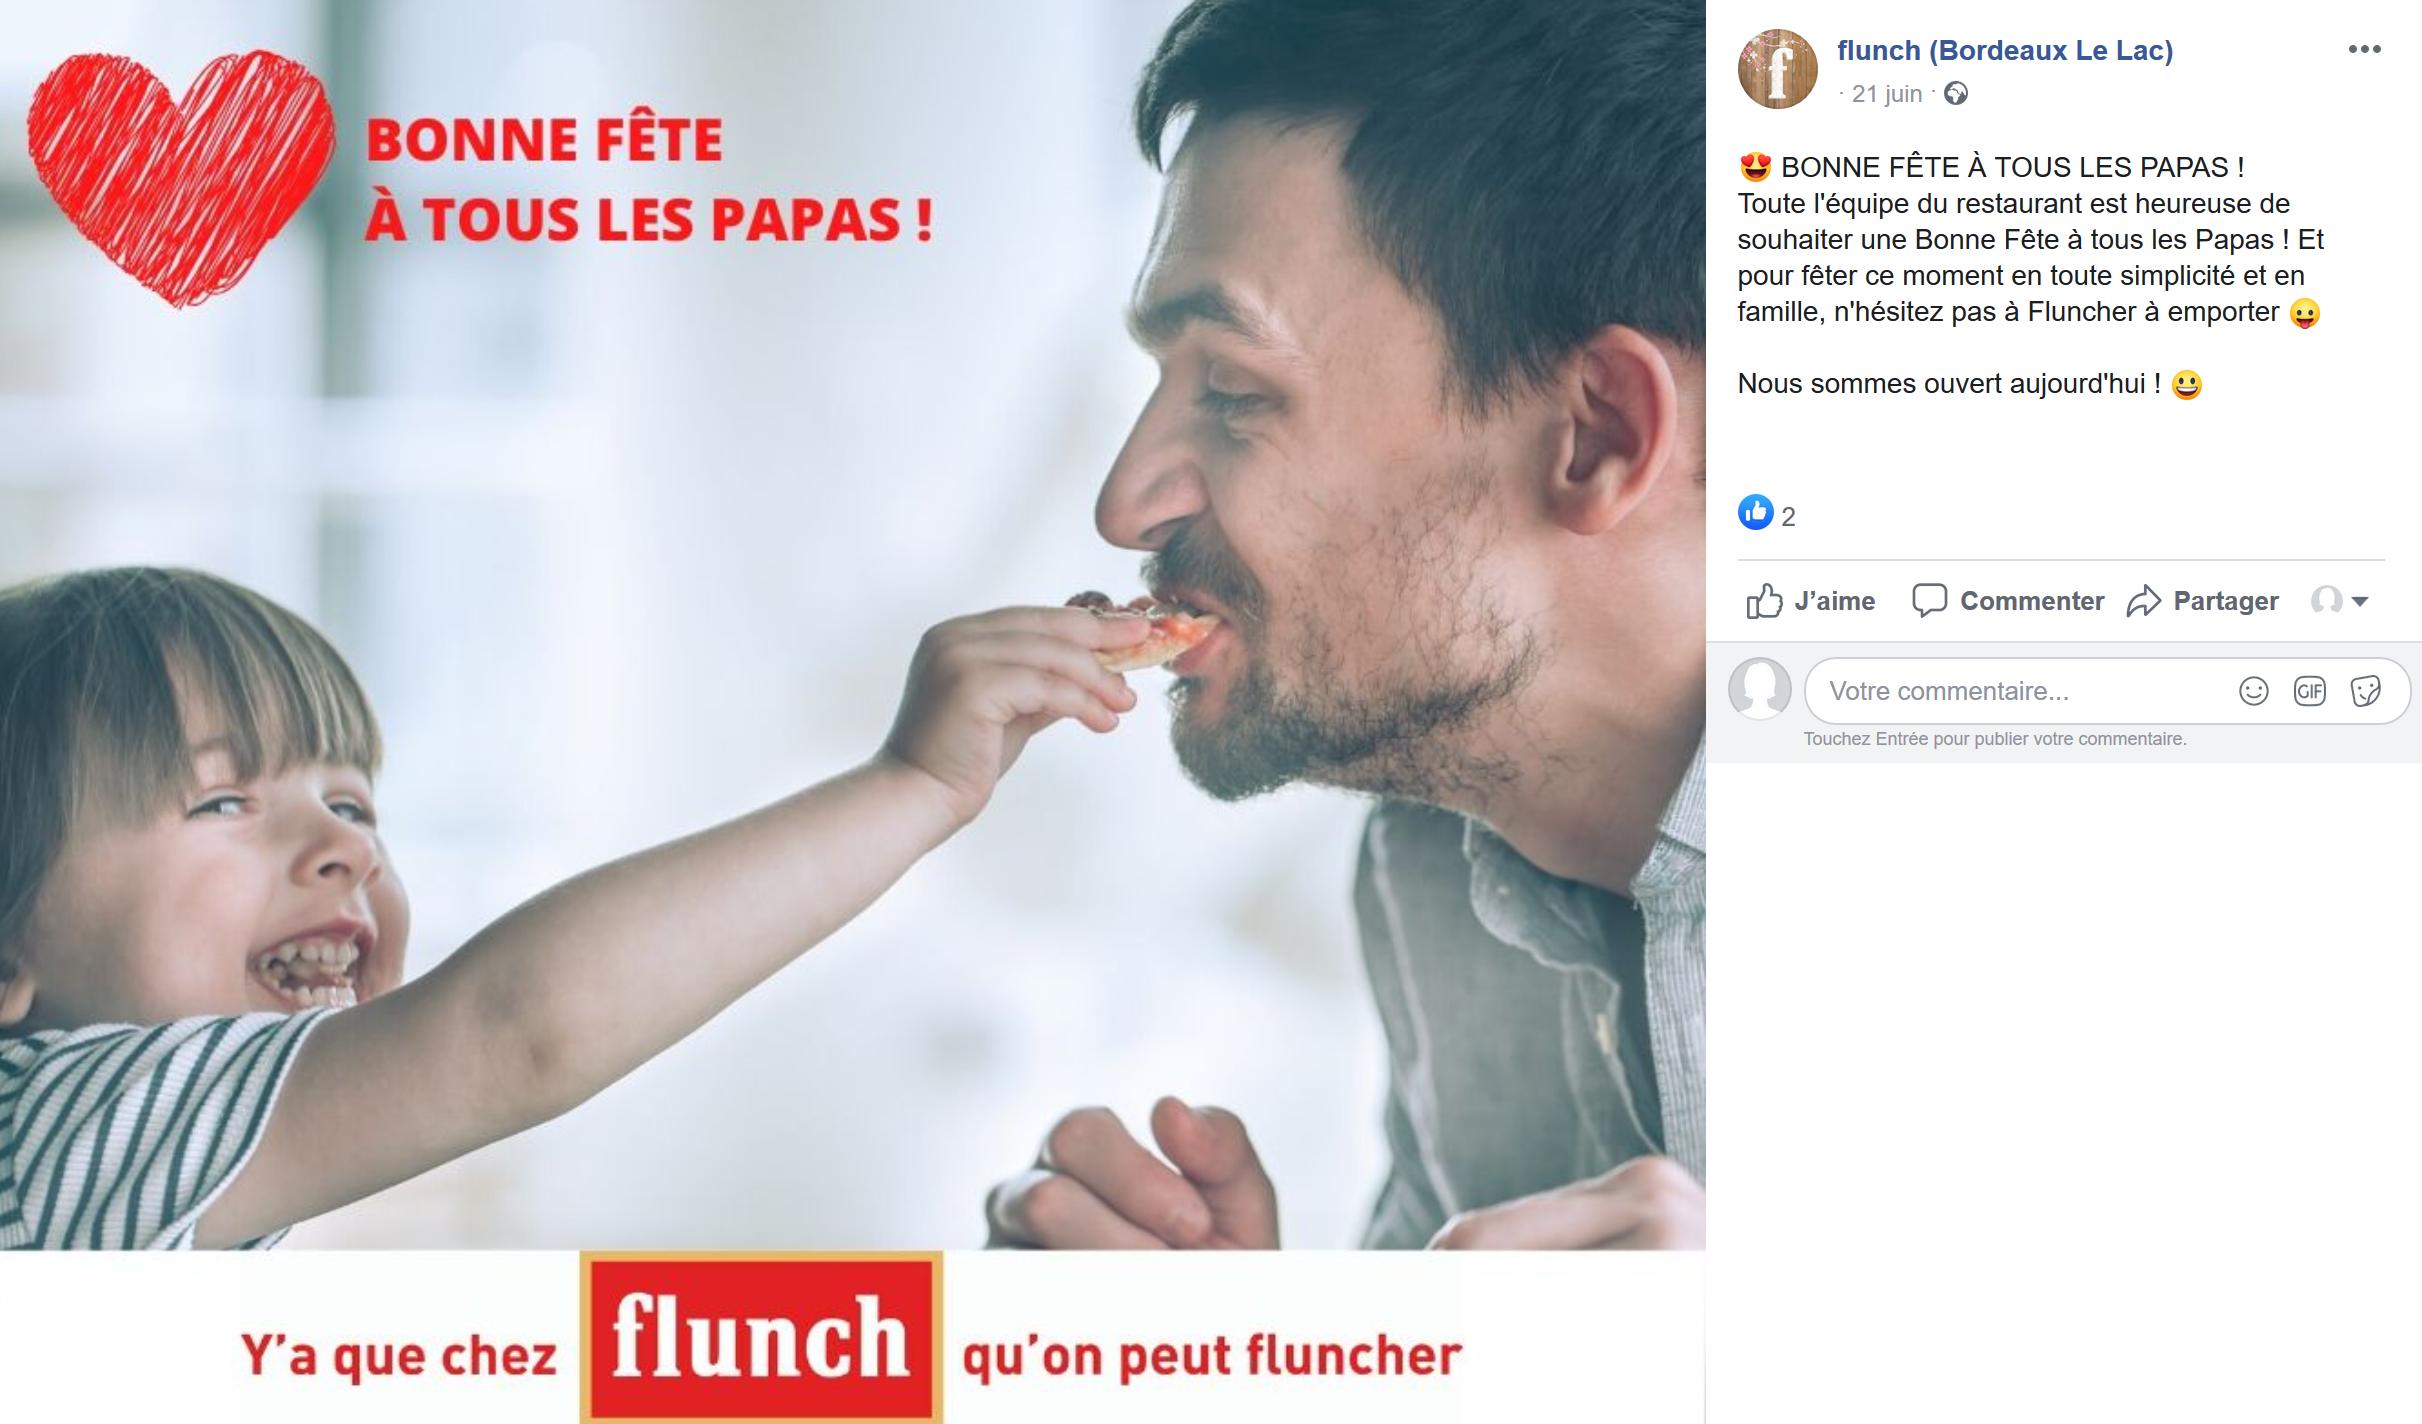 animation-facebook-restaurateur-flunch-bordeaux-lac-gironde